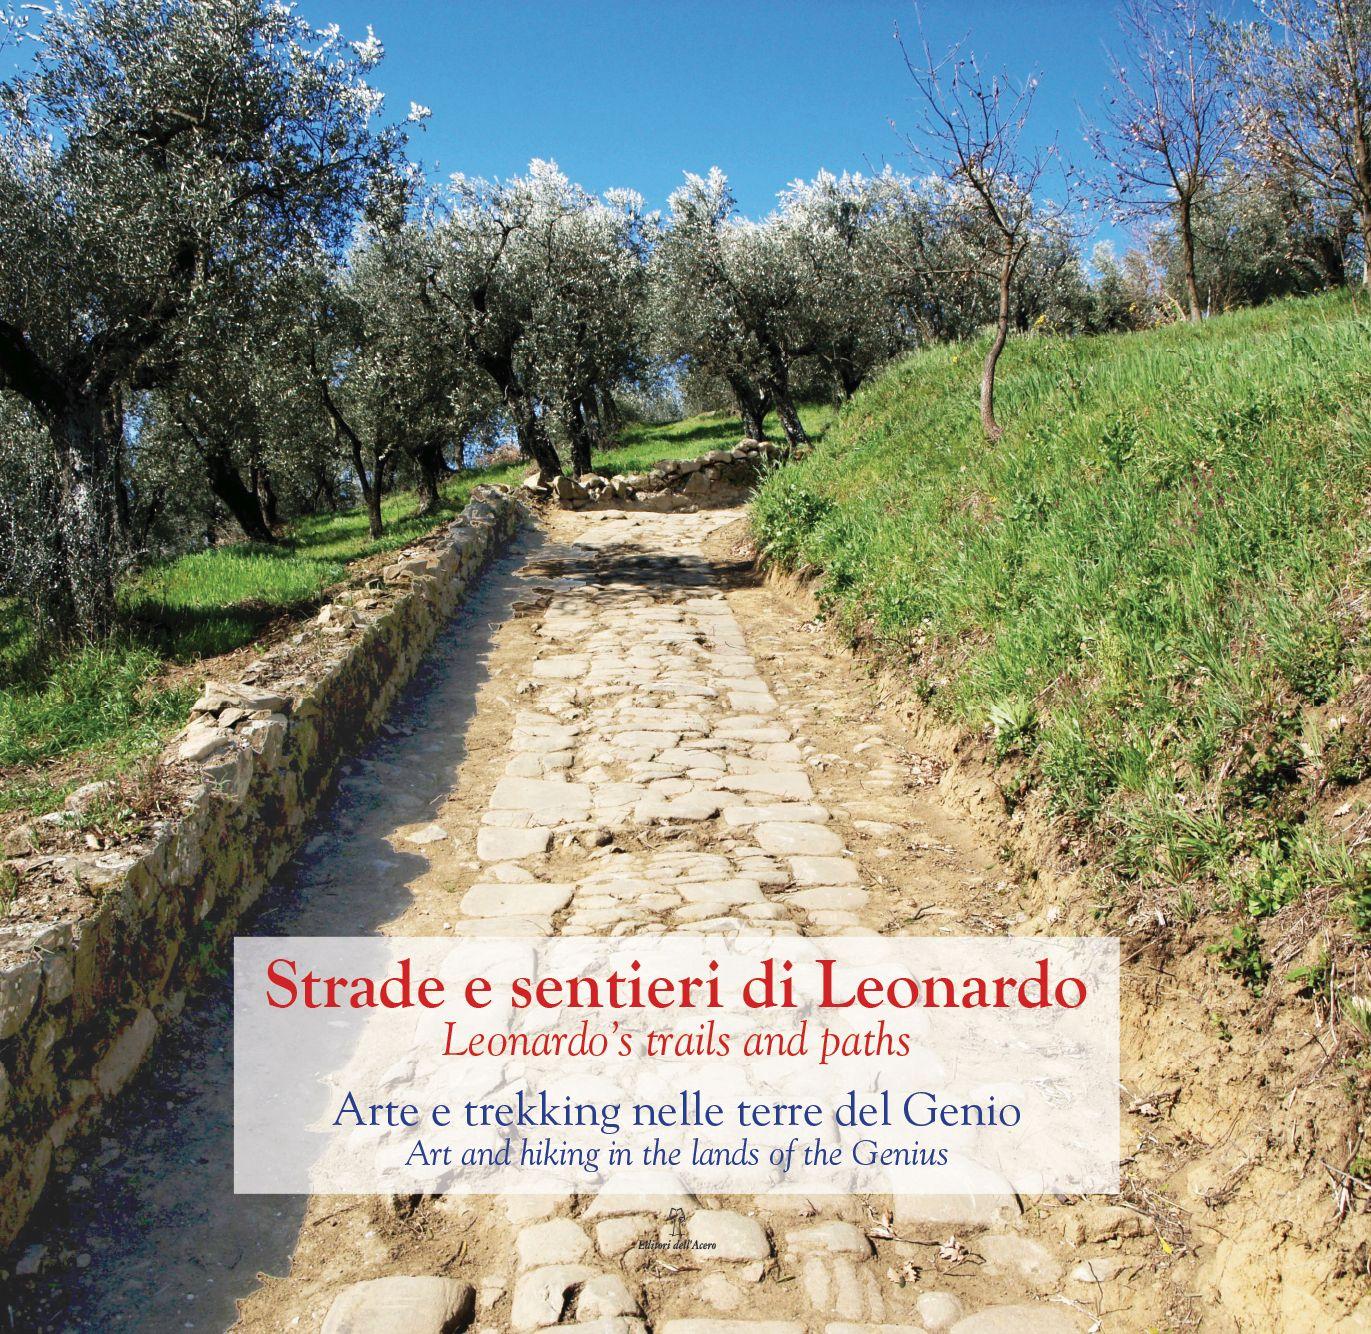 Strade e sentieri di Leonardo